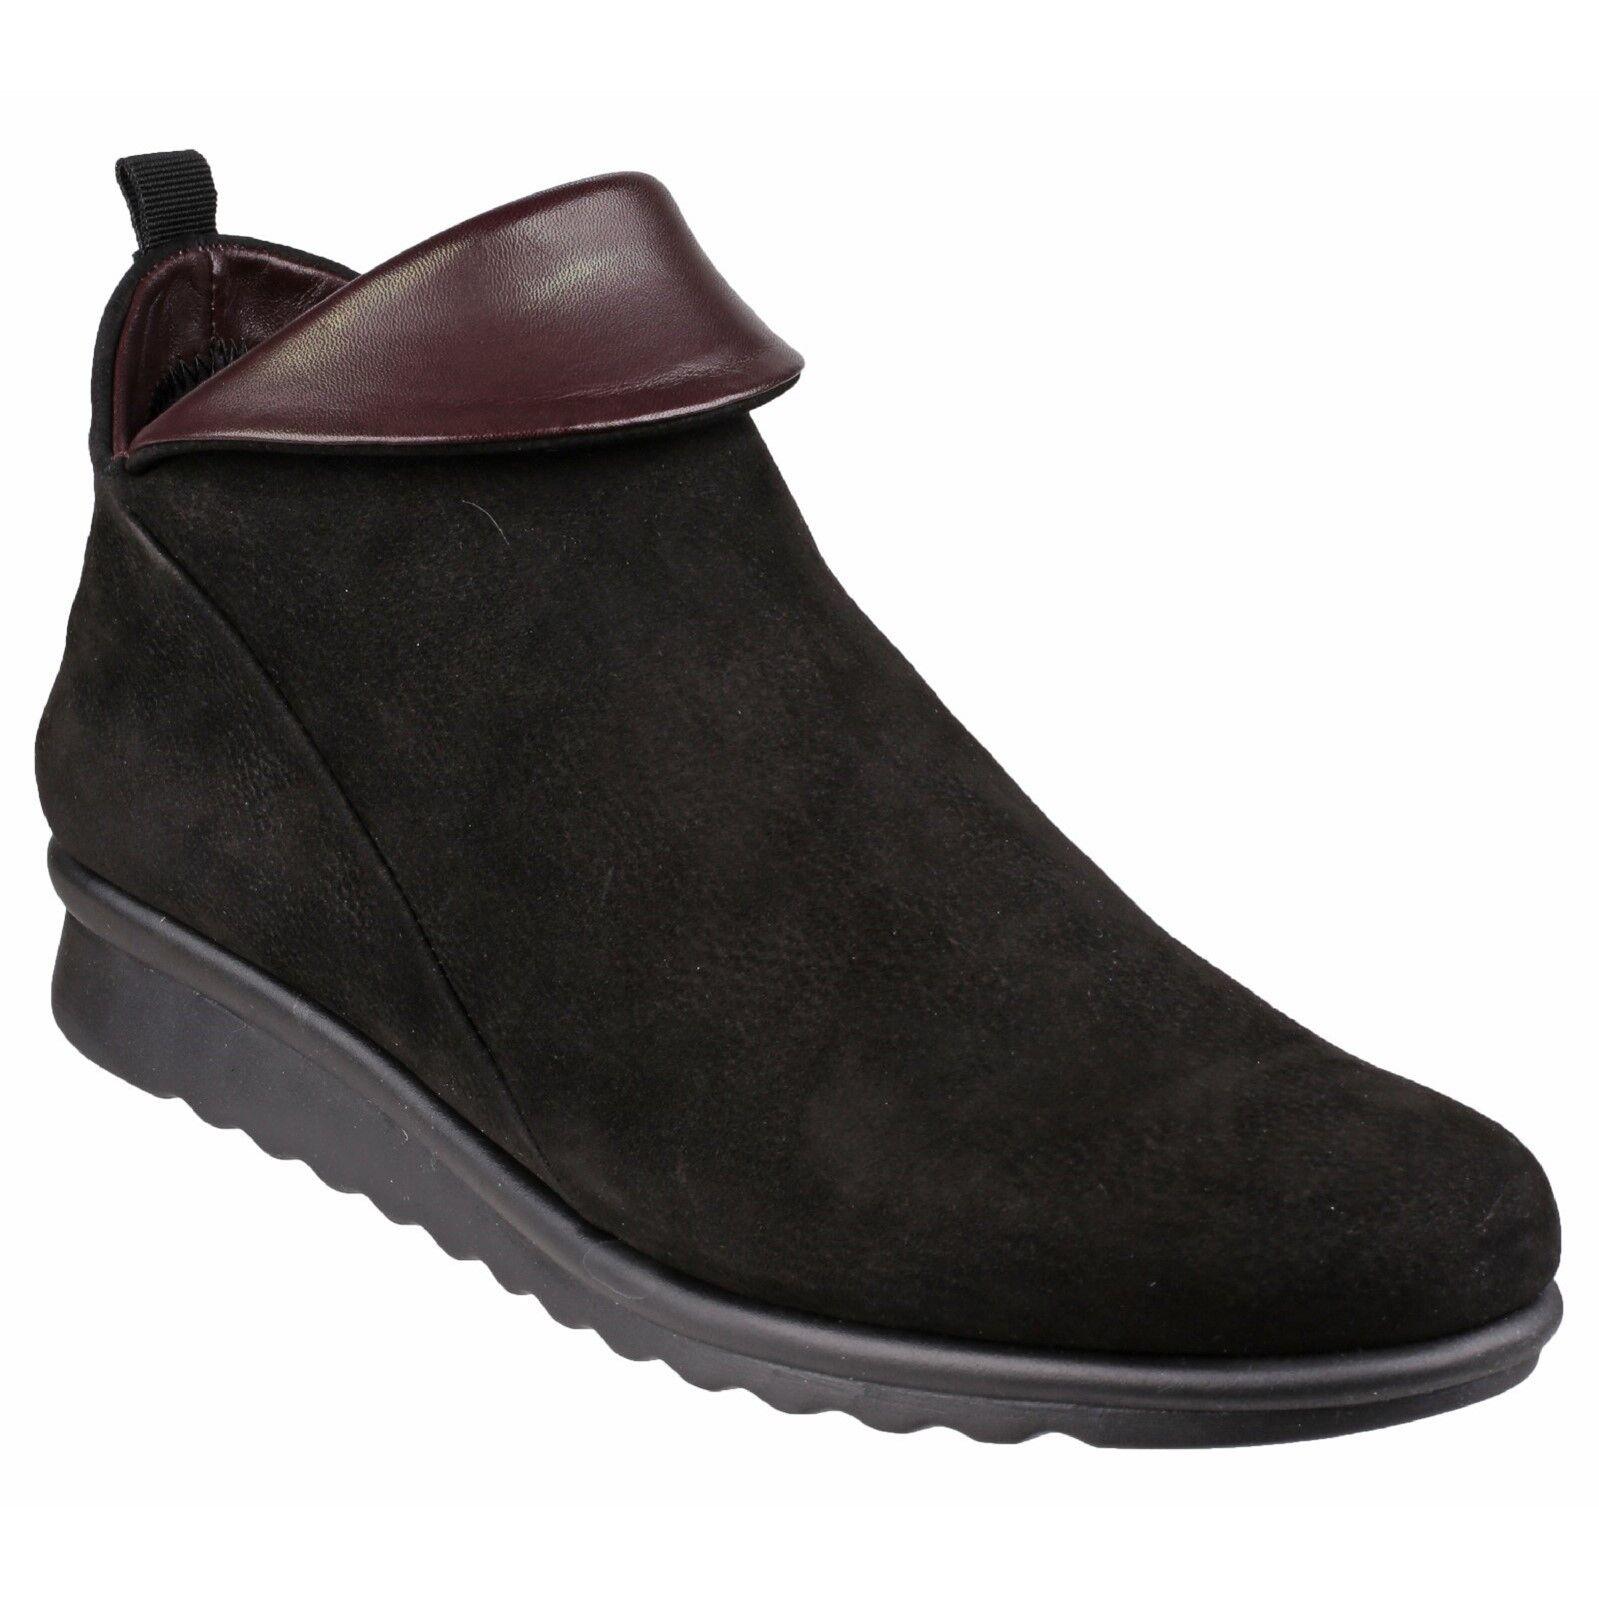 Grandes zapatos con descuento The Flexx Pam Damme Dakar Cashmere Ladies Ankle Boot